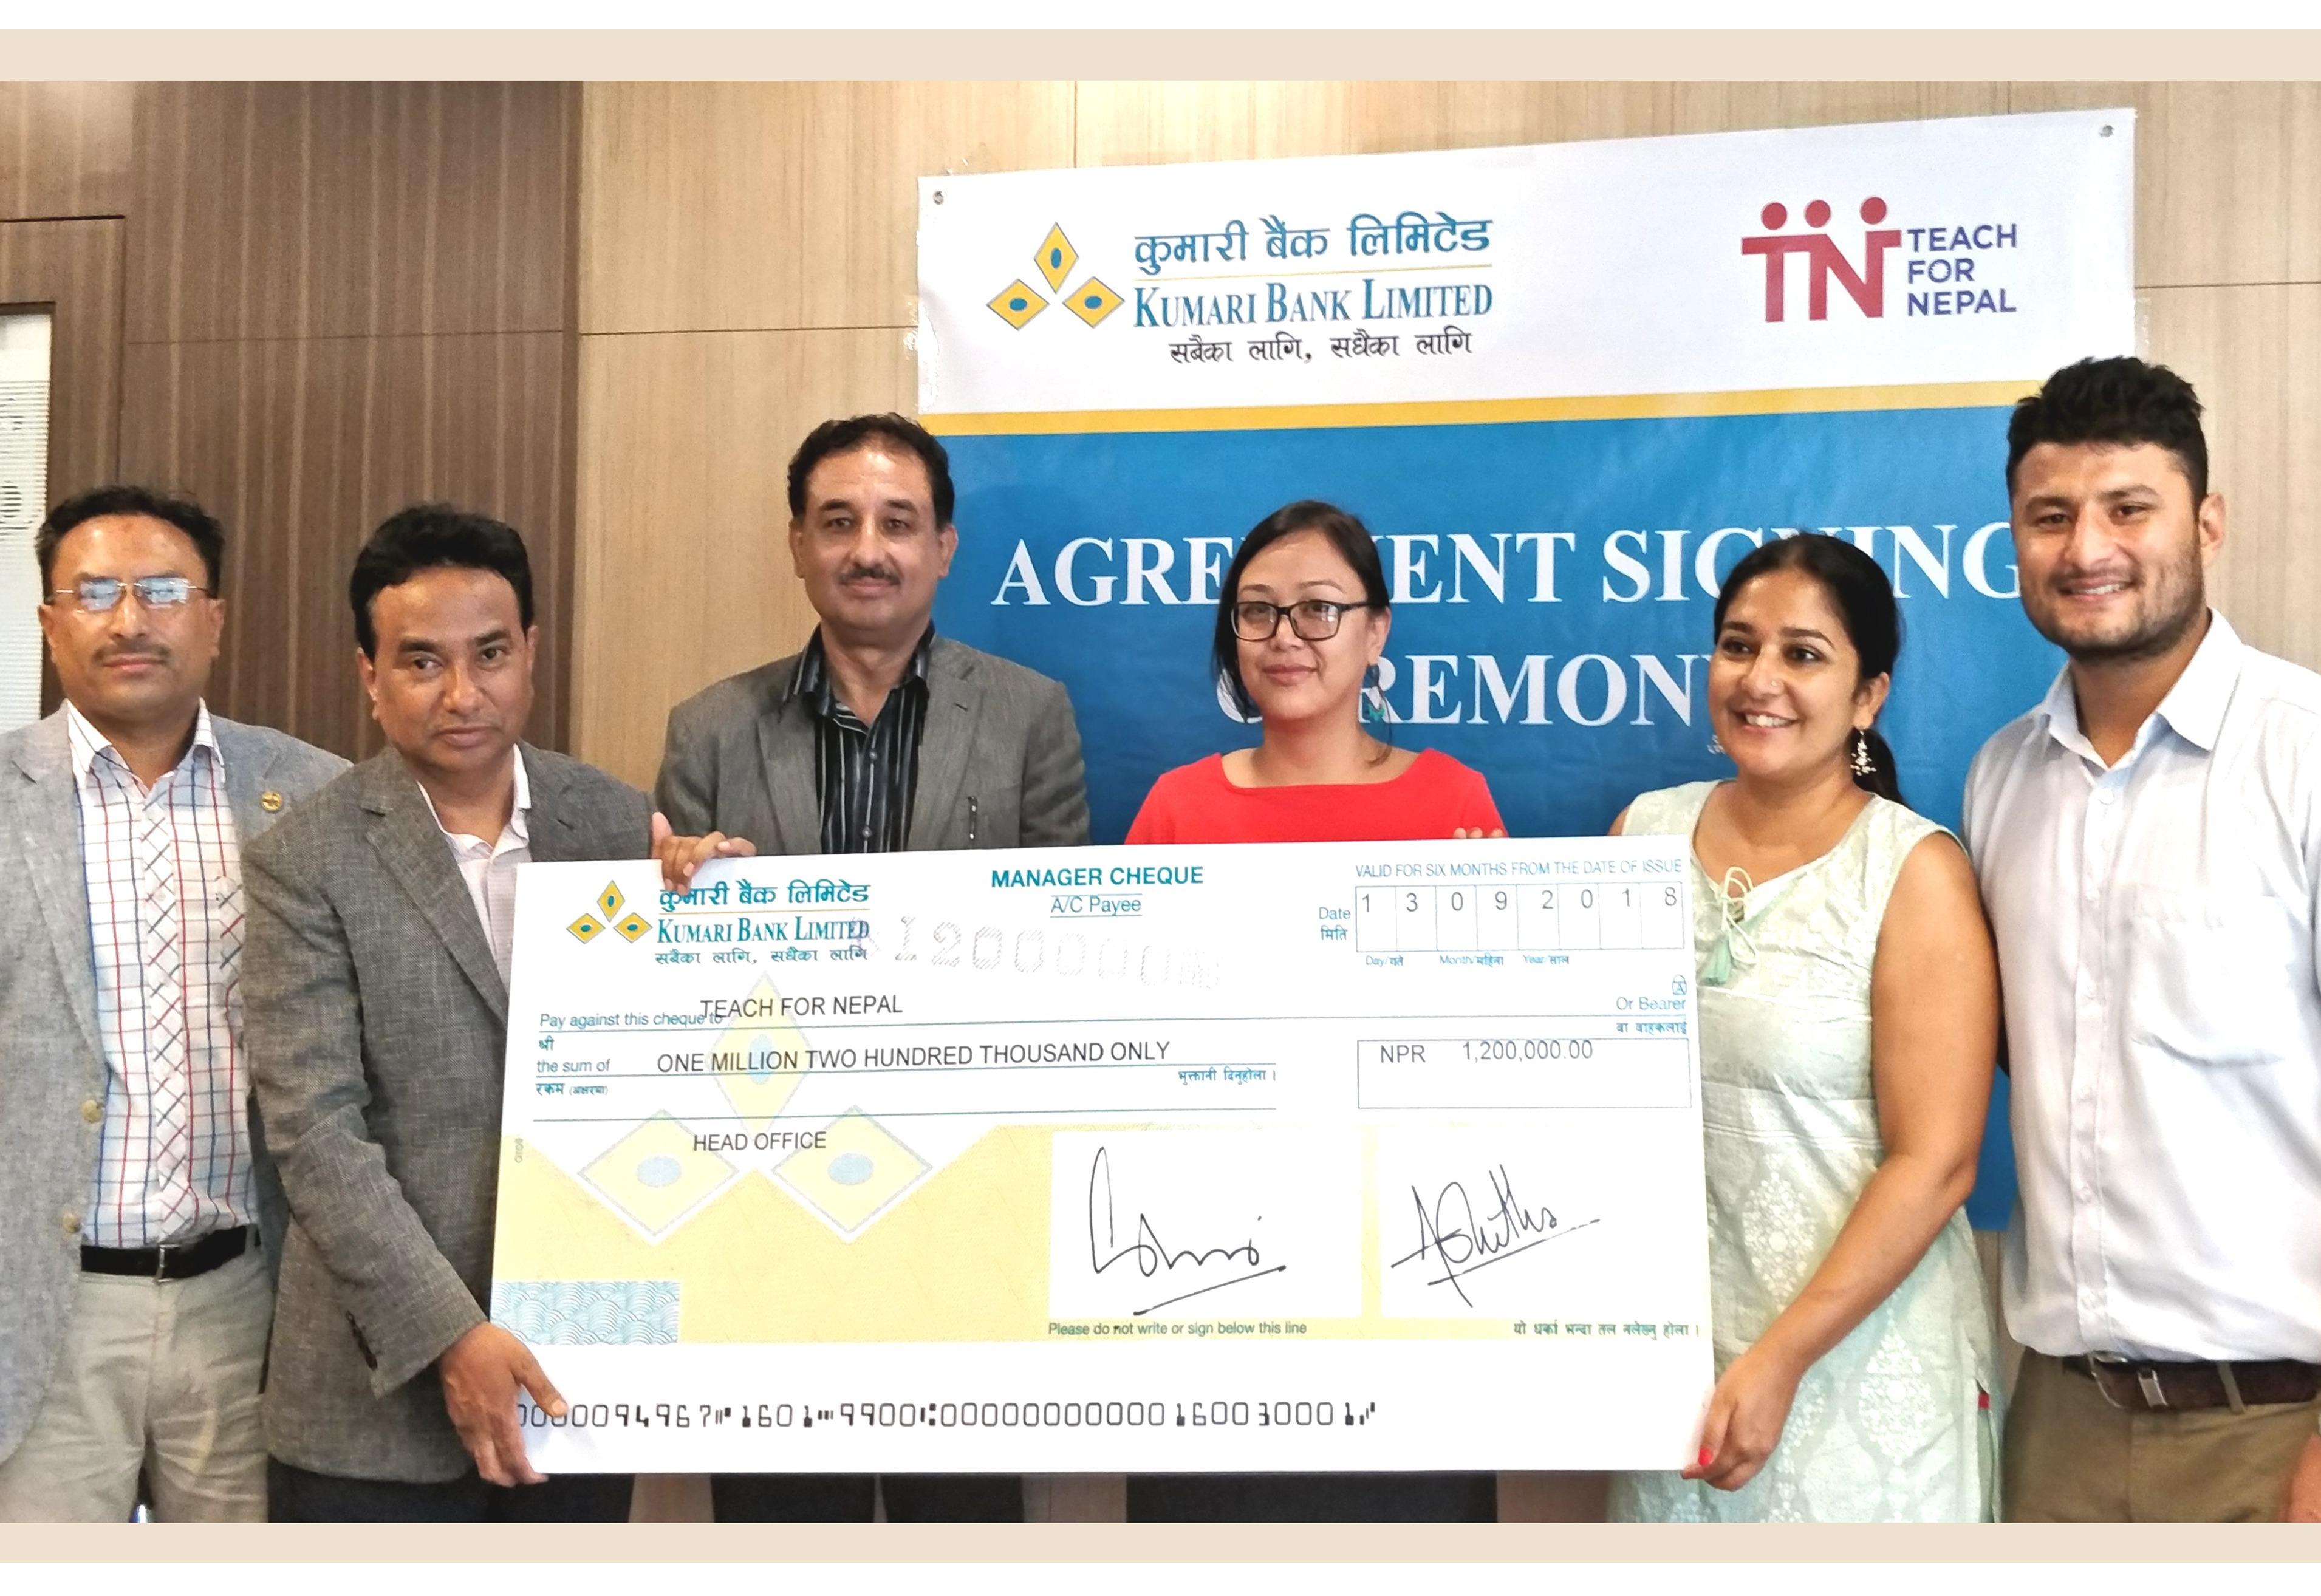 कुमारी बैंकद्धारा 'टिच फर नेपाल'लाई सहयोग